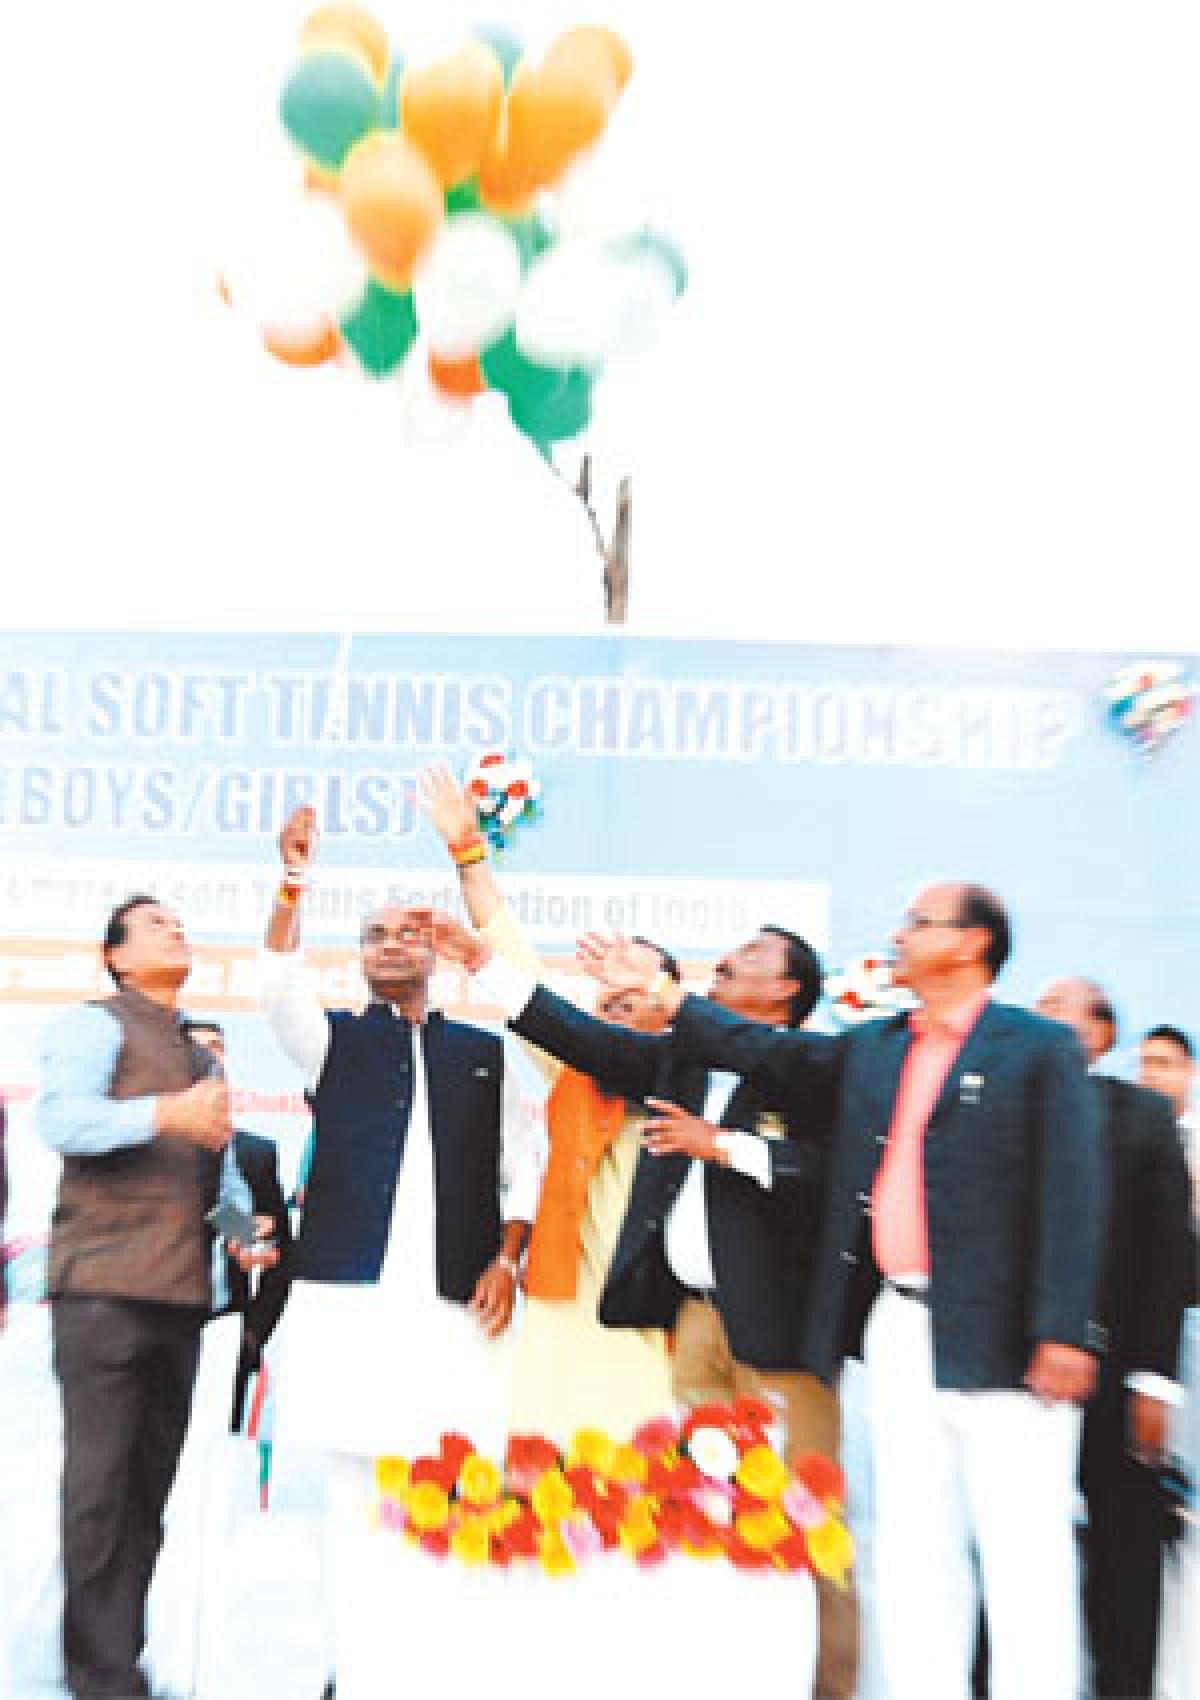 Bhopal: National Soft Tennis championship begins